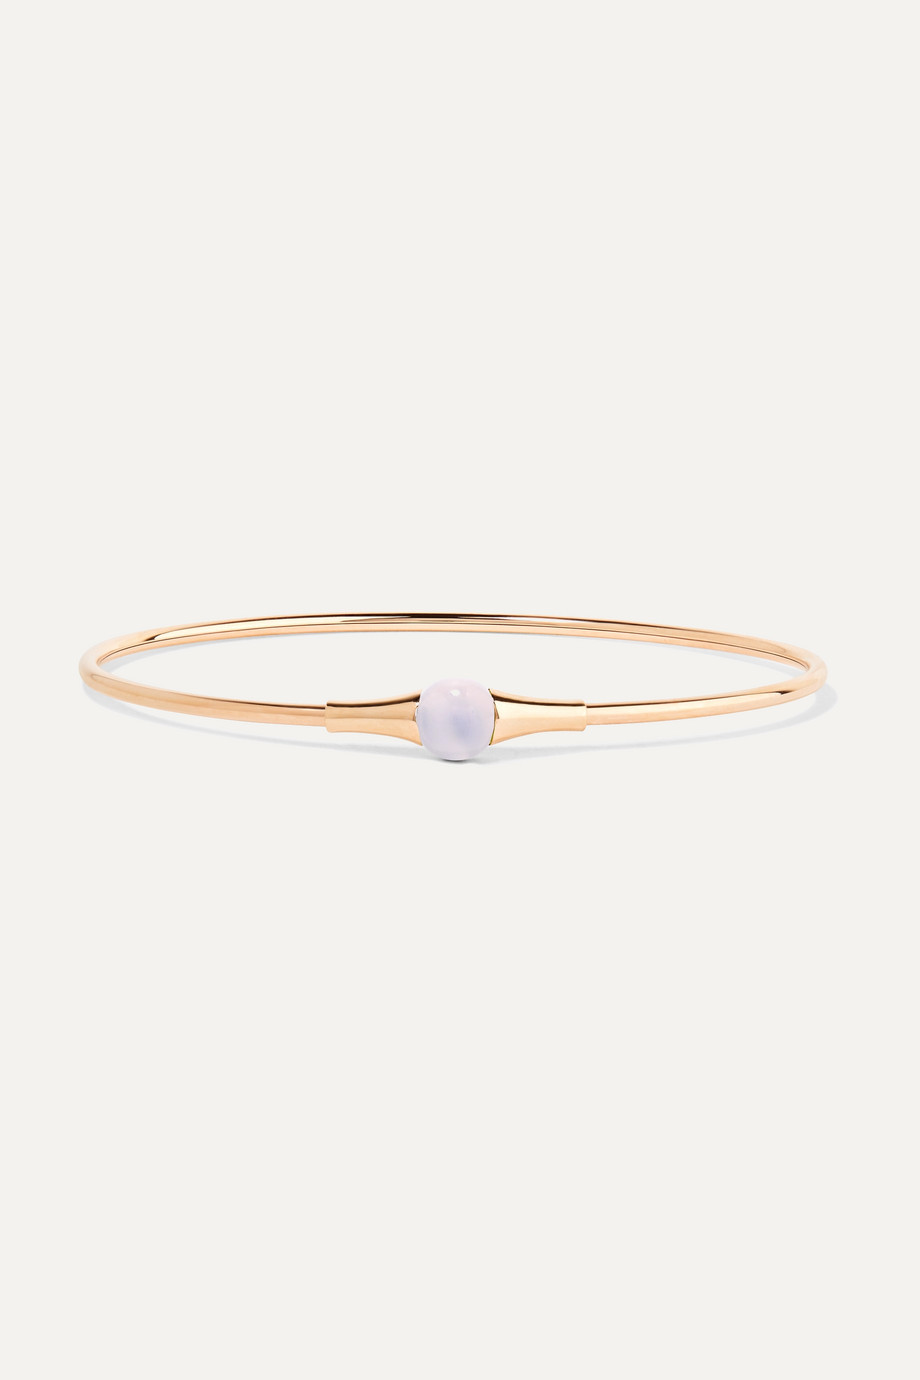 Pomellato M'ama non M'ama 18-karat rose gold moonstone bracelet